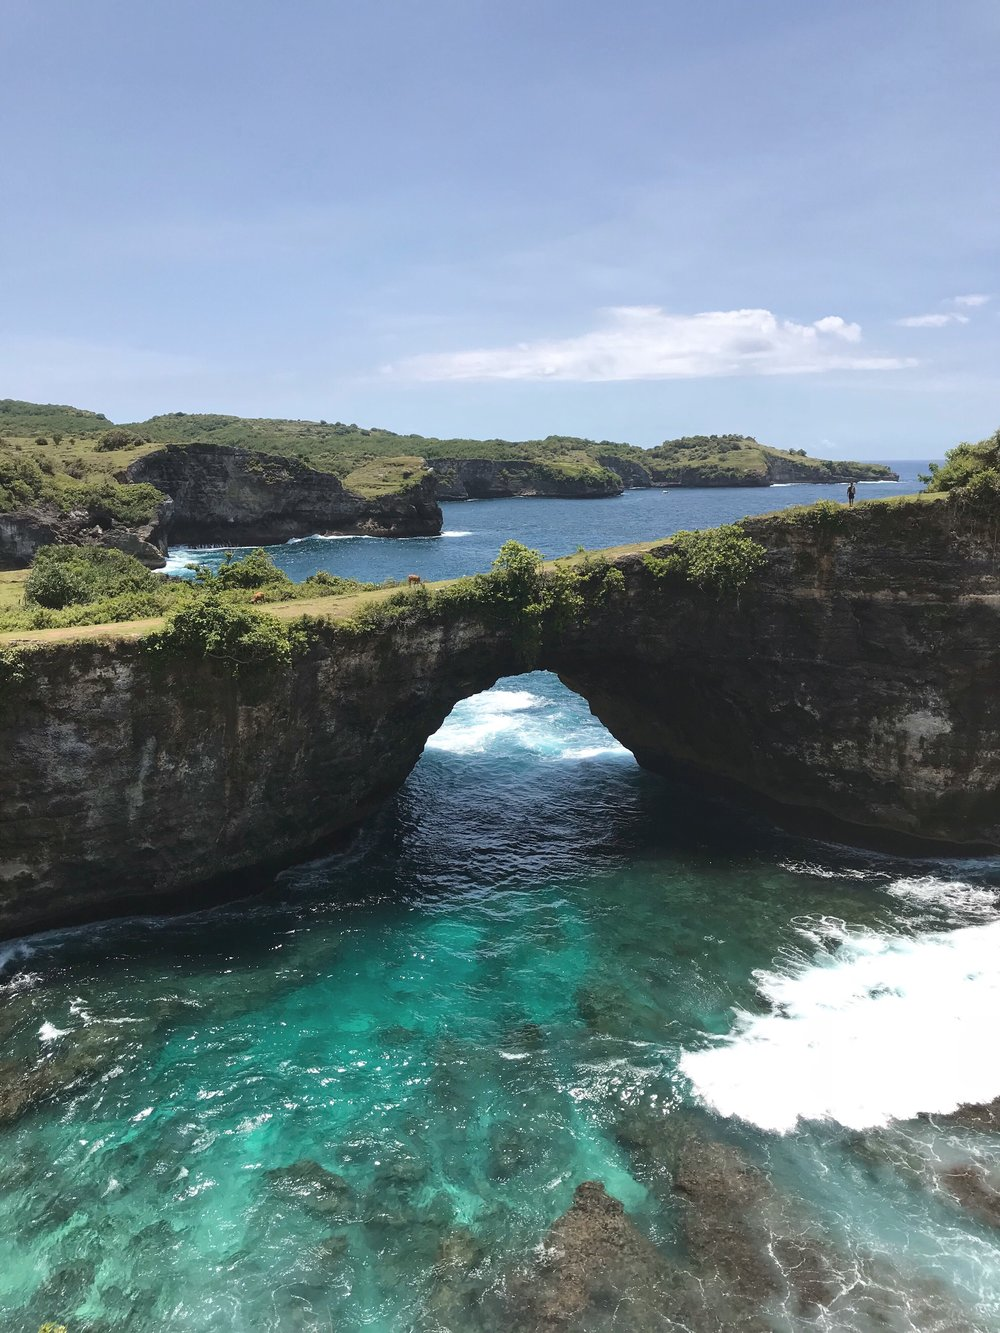 3: Broken Beach - Sakti, Bunga Mekar, Nusapenida, Klungkung Regency, Bali 80771, Indonesia